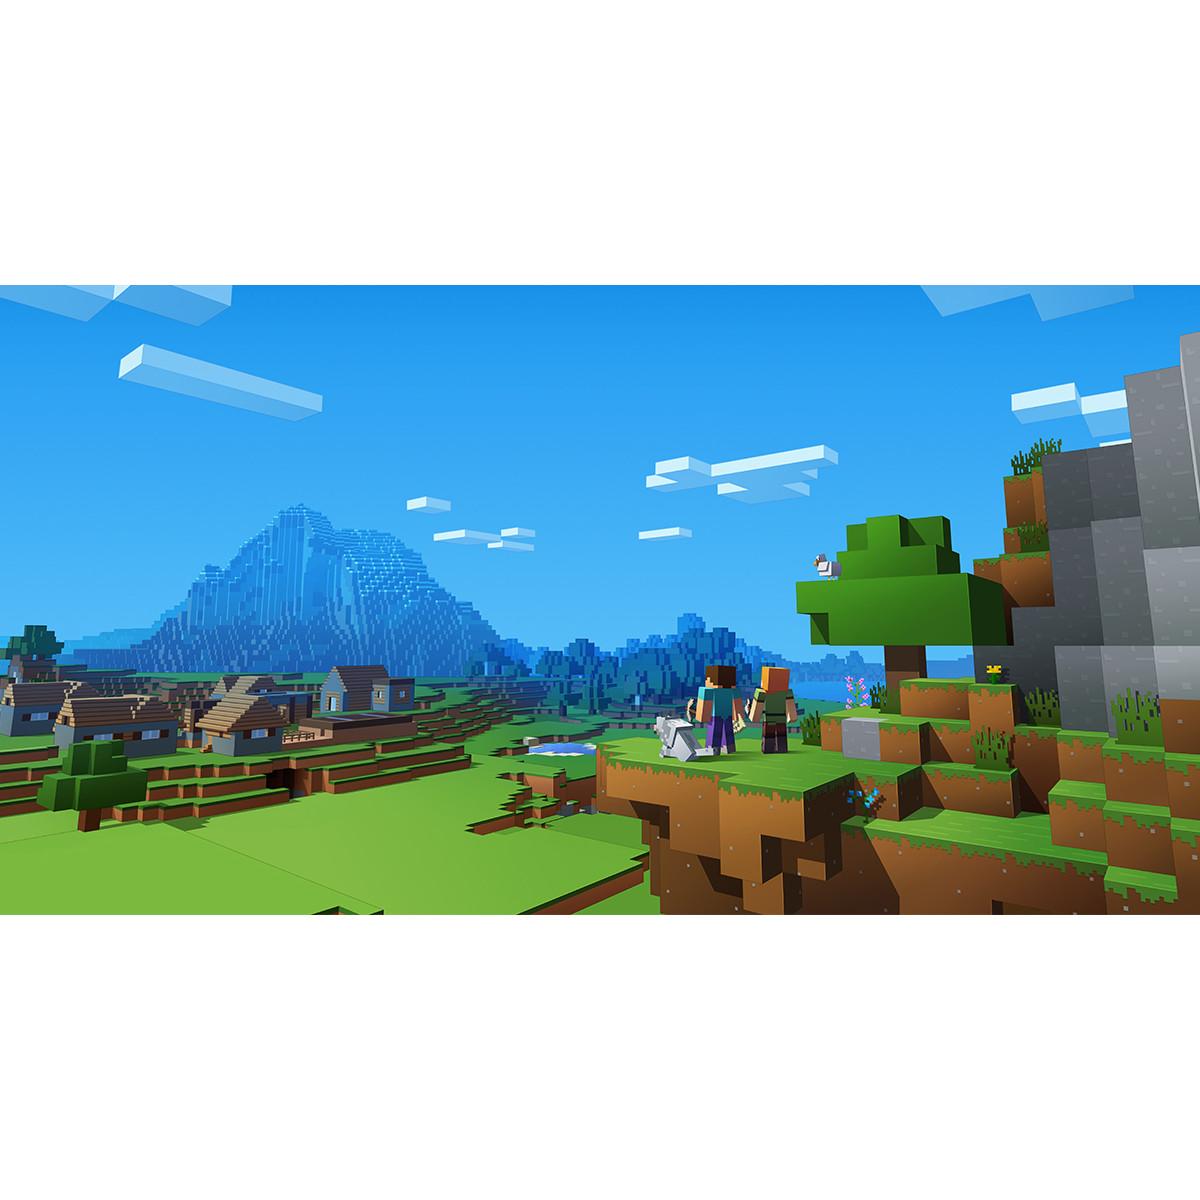 Joc Minecraft - Full Game pentru Xbox one (Download Code) 1